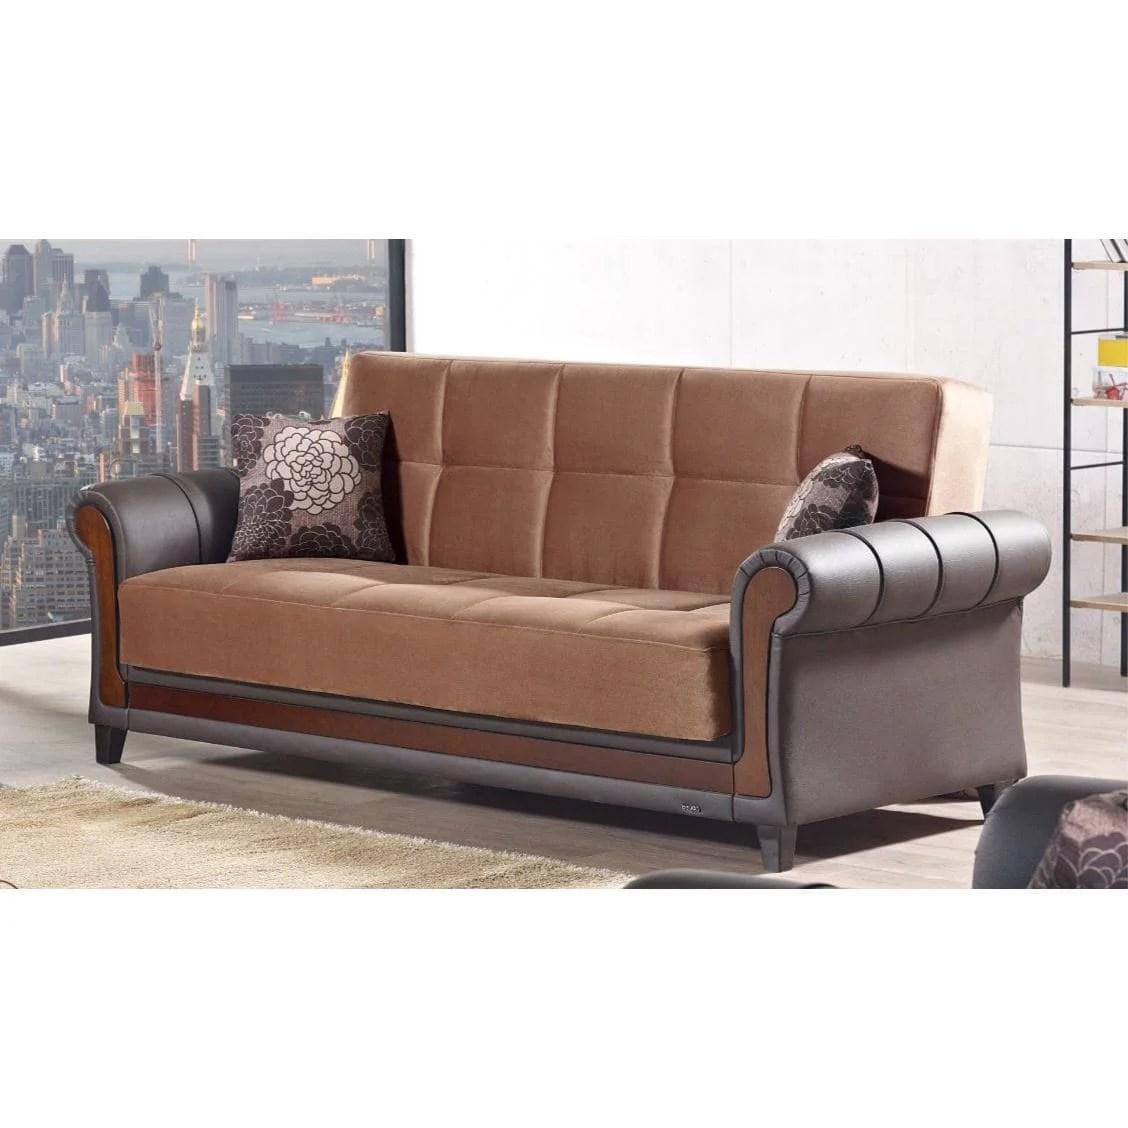 living room furniture long island colour schemes 2018 empire brown fabric vinyl sleeper storage sofa